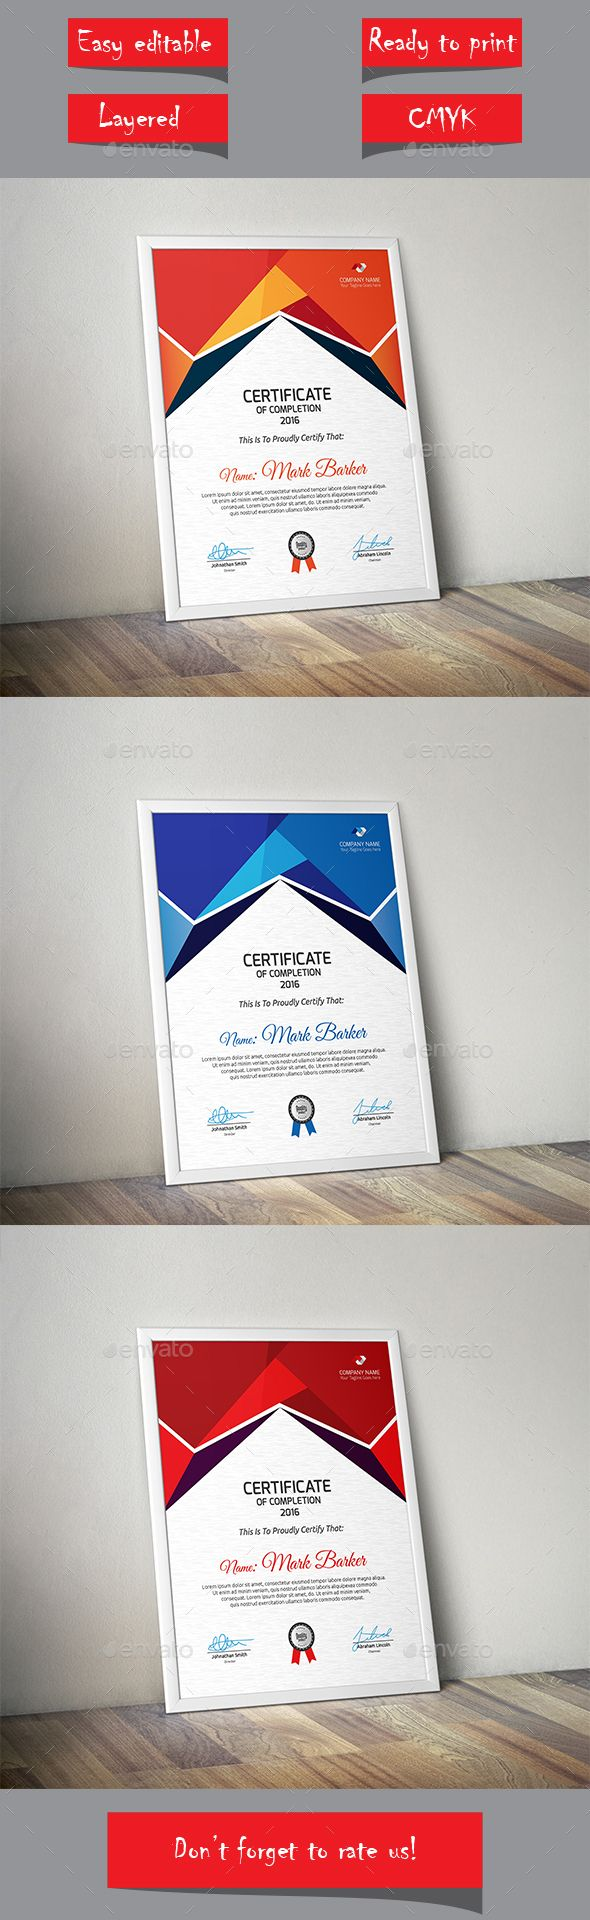 8 best 獎狀、證書 images on Pinterest | Award certificates ...